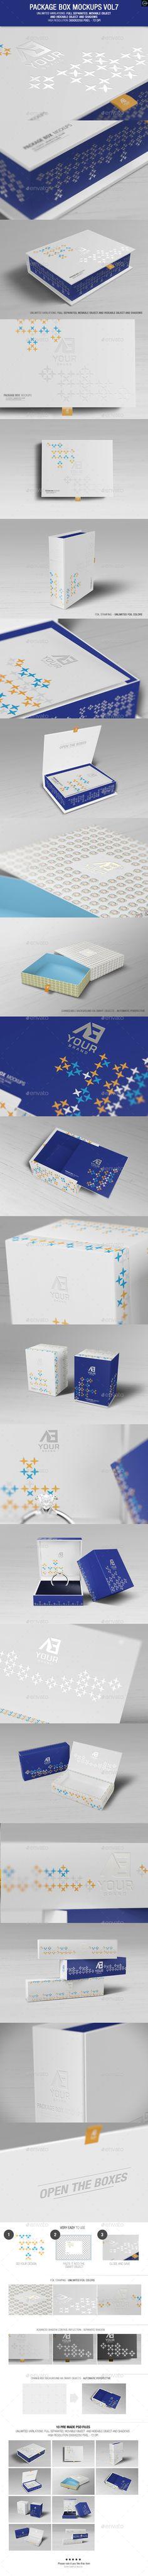 Package Box Mockups Vol7 - Packaging Product Mock-Ups